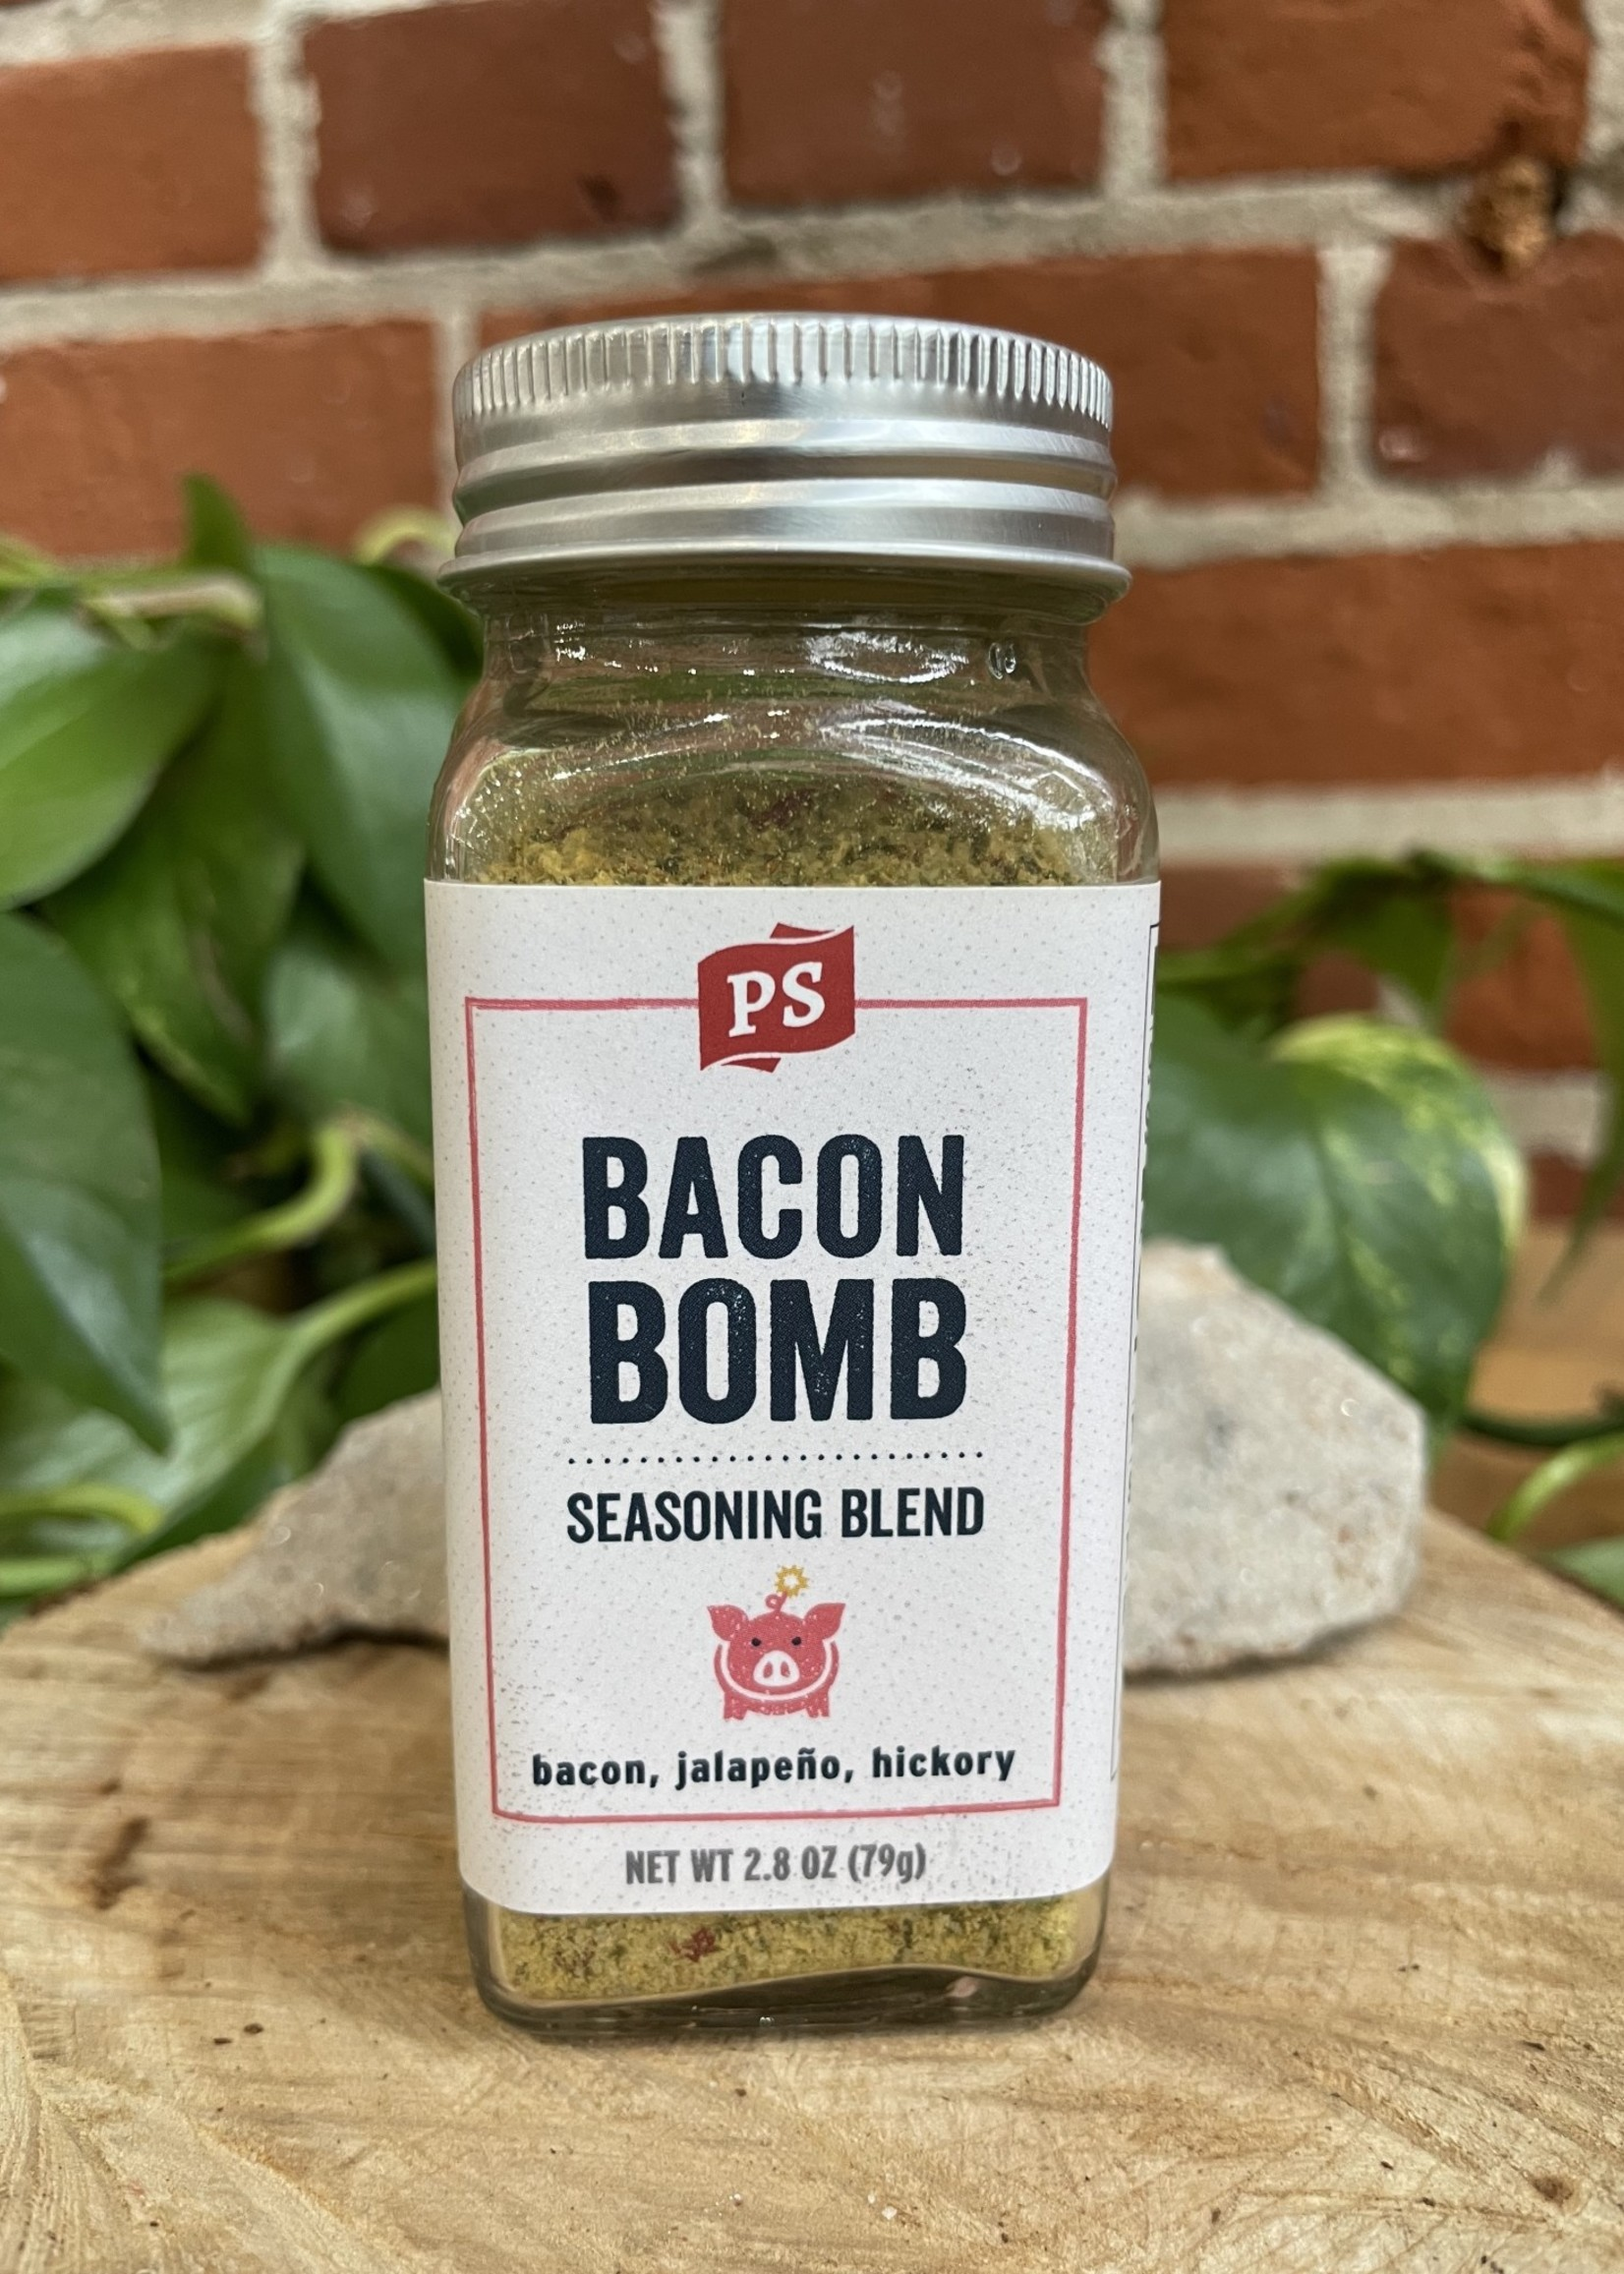 PS Seasoning PS Seasoning Shakers